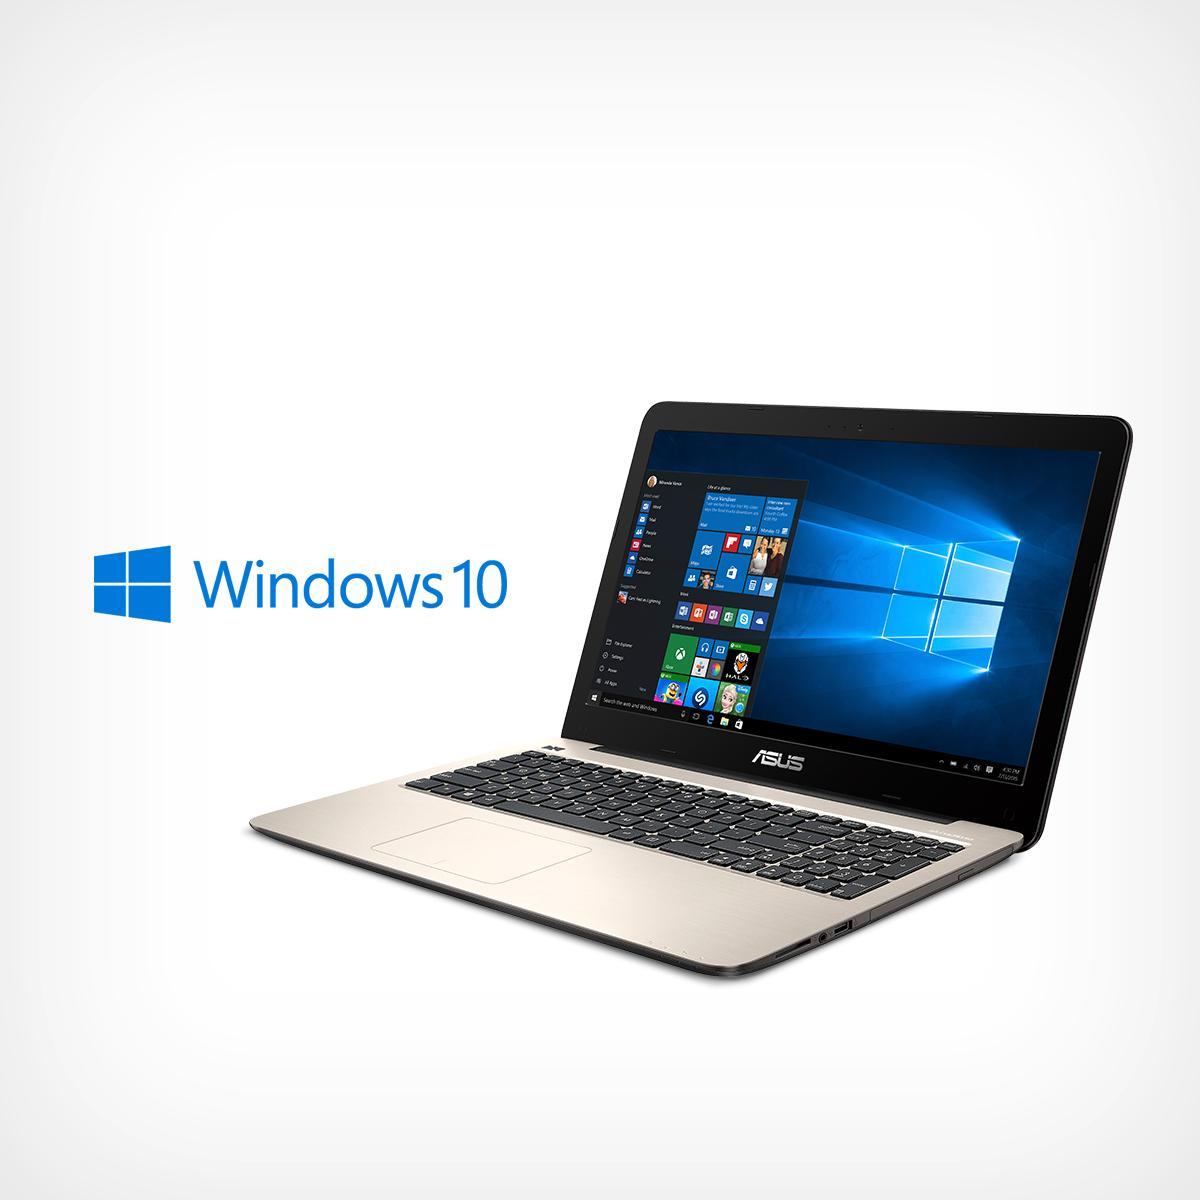 Amazon De: Amazon.ca Laptops: Asus VivoBook F556UA-AB54 15.6-Inch